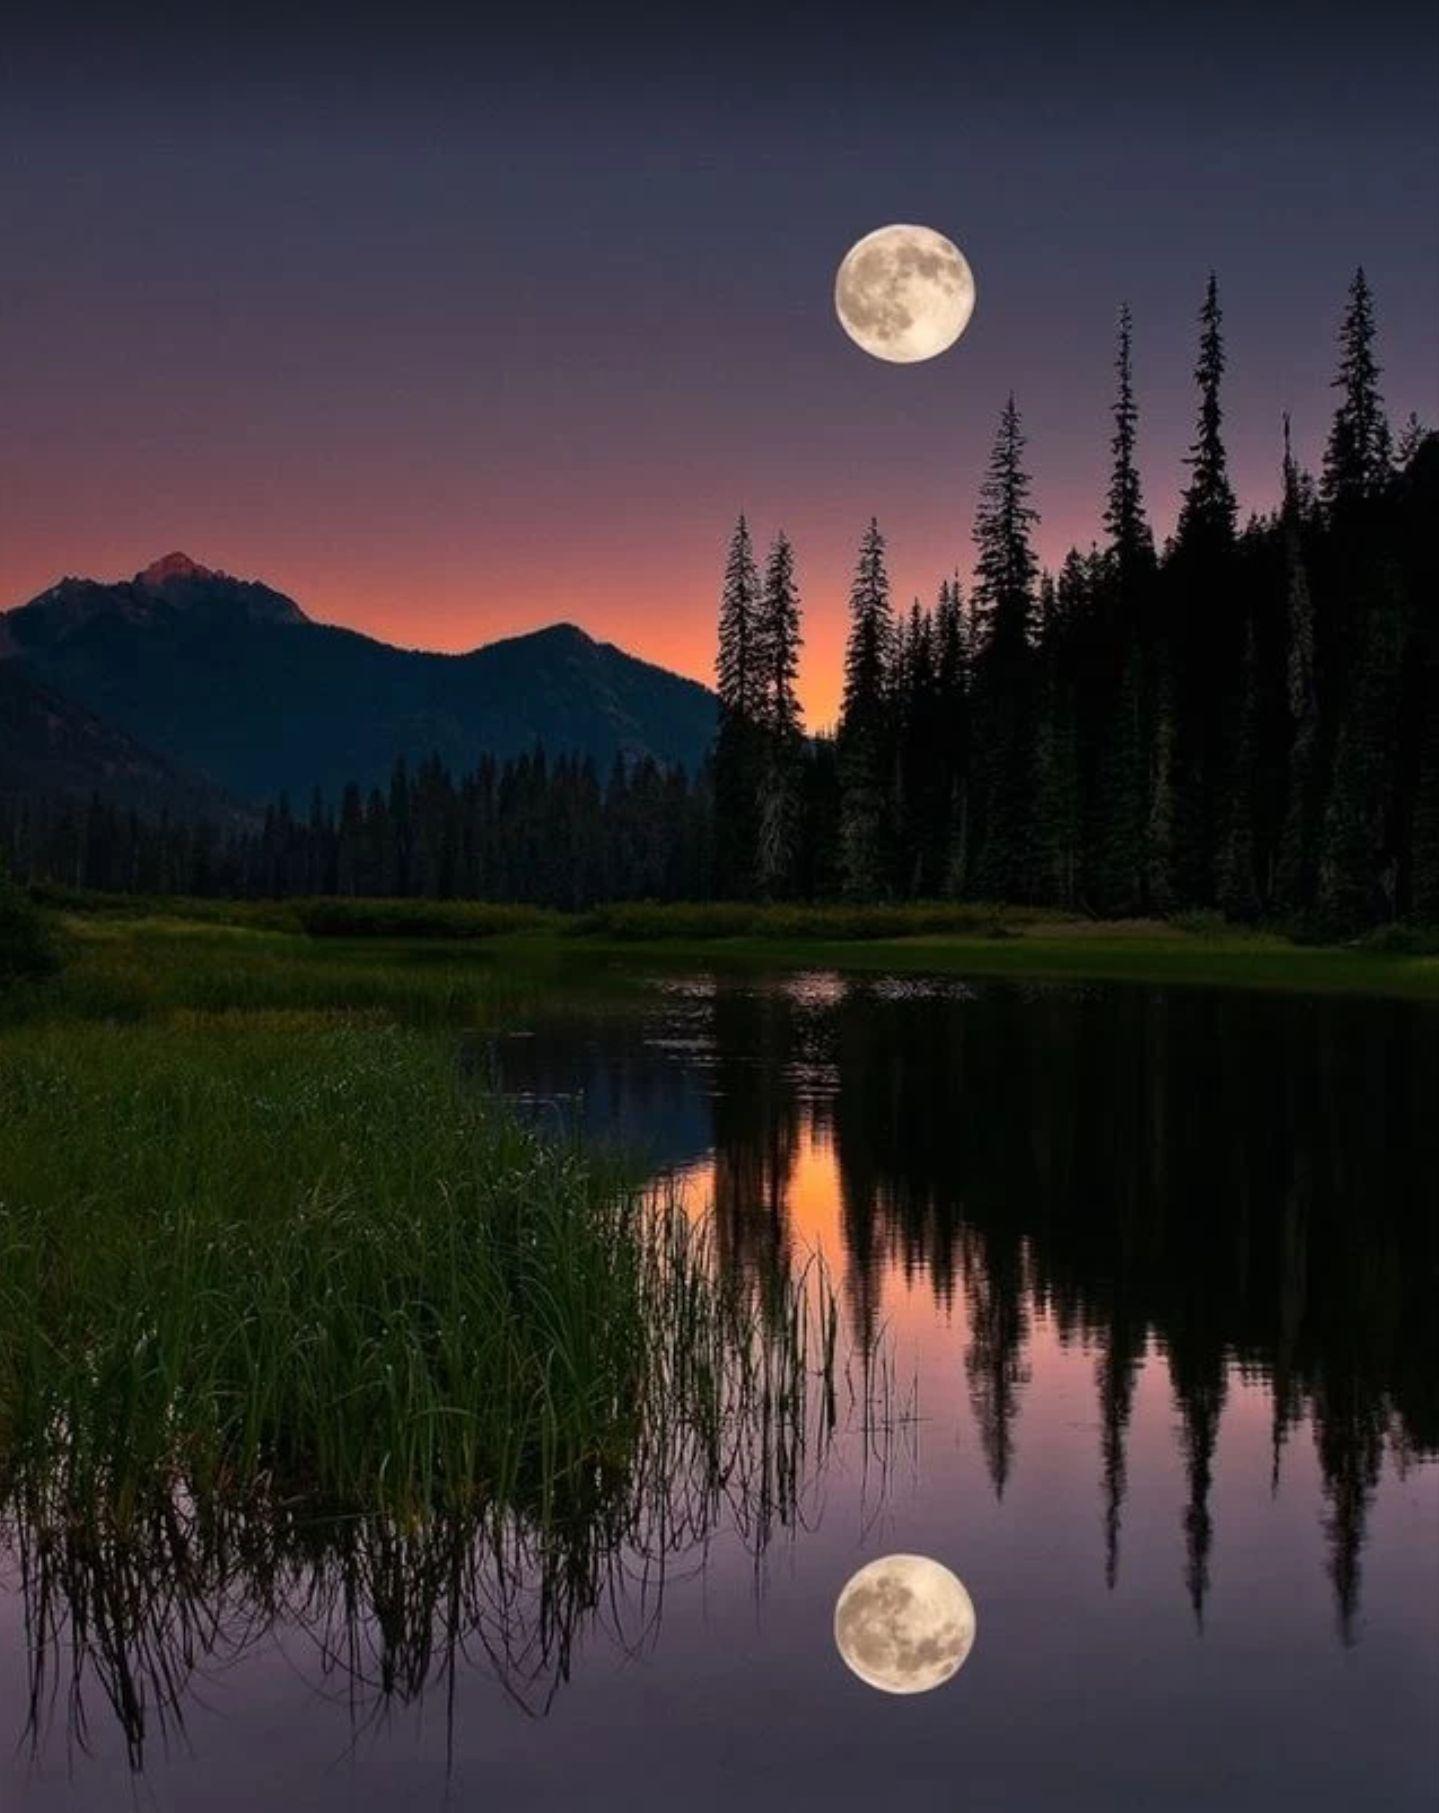 Moon Amazing Reflection Nature Photography Beautiful Moon Nature Photos